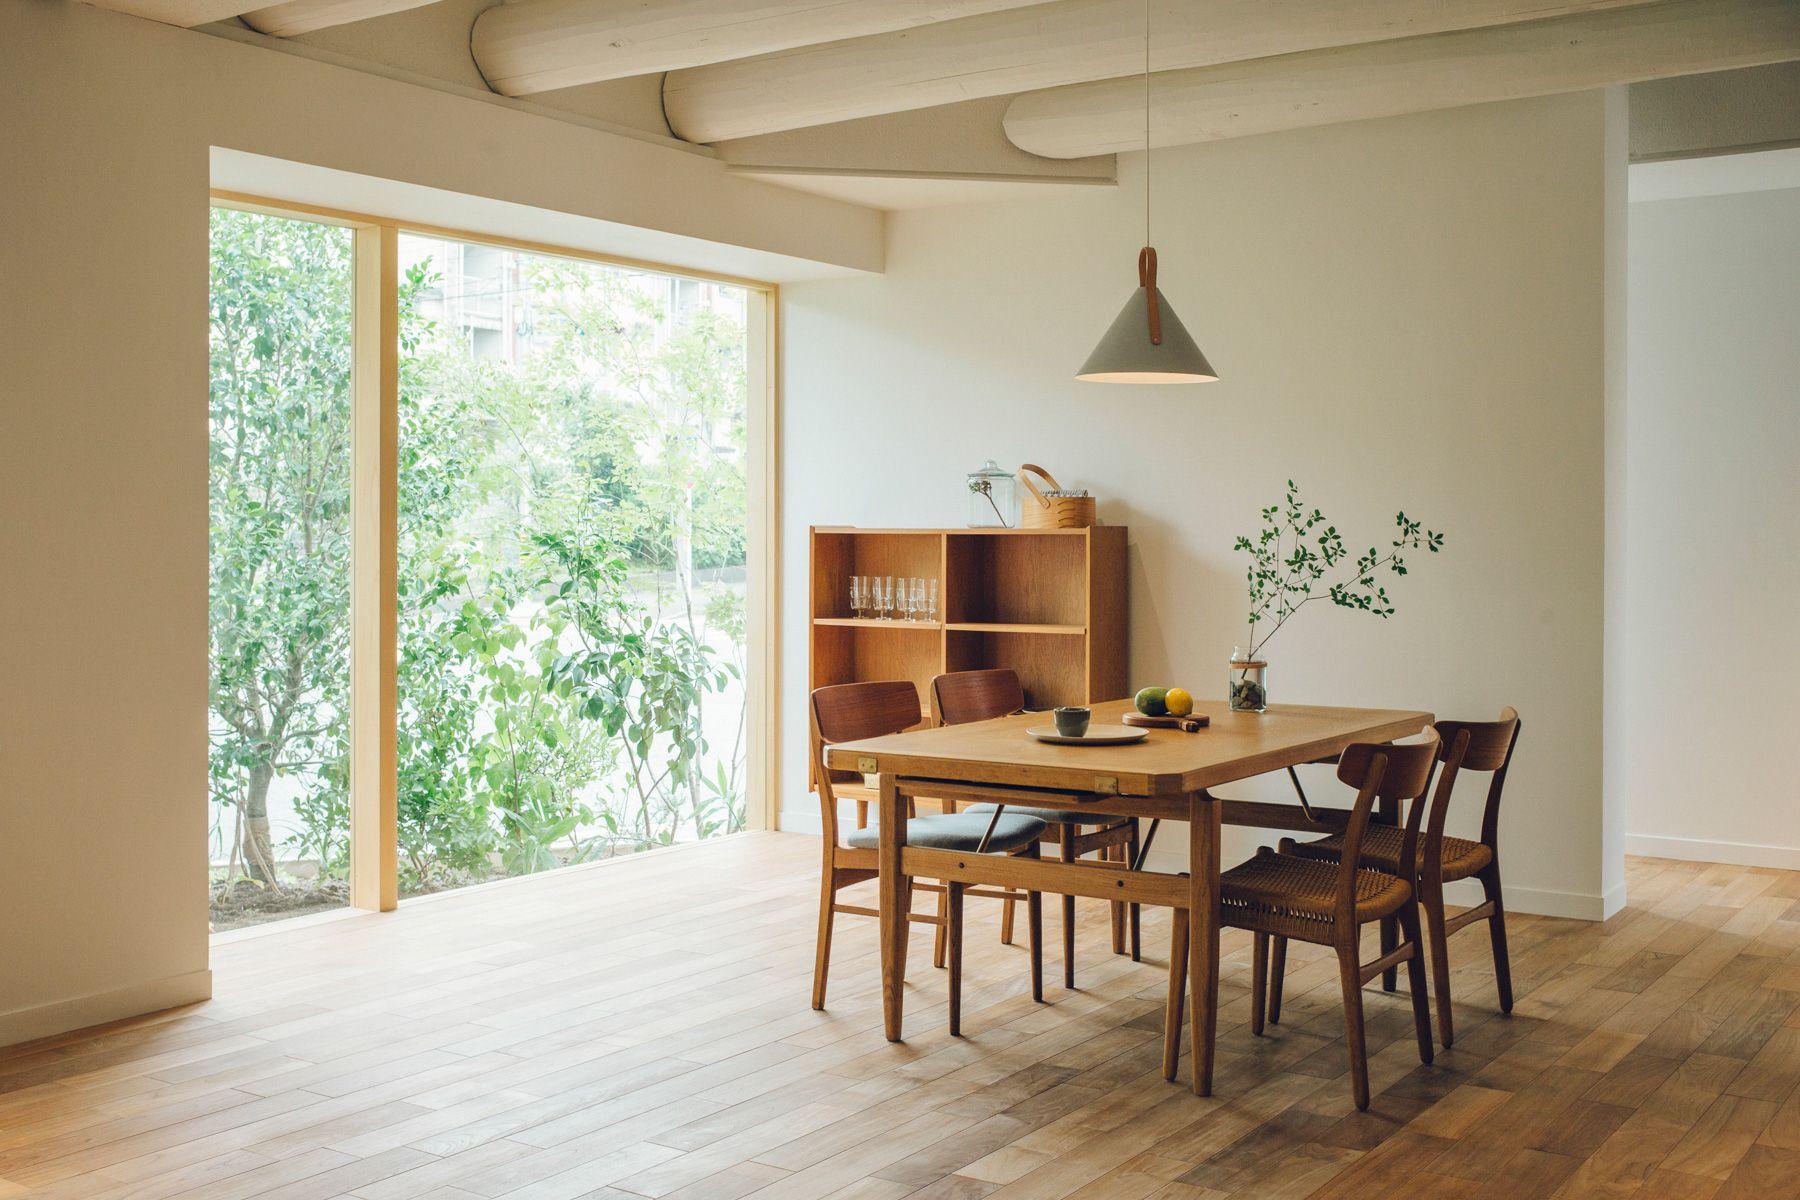 ferme studio  (フェルム スタジオ)living&kitchen